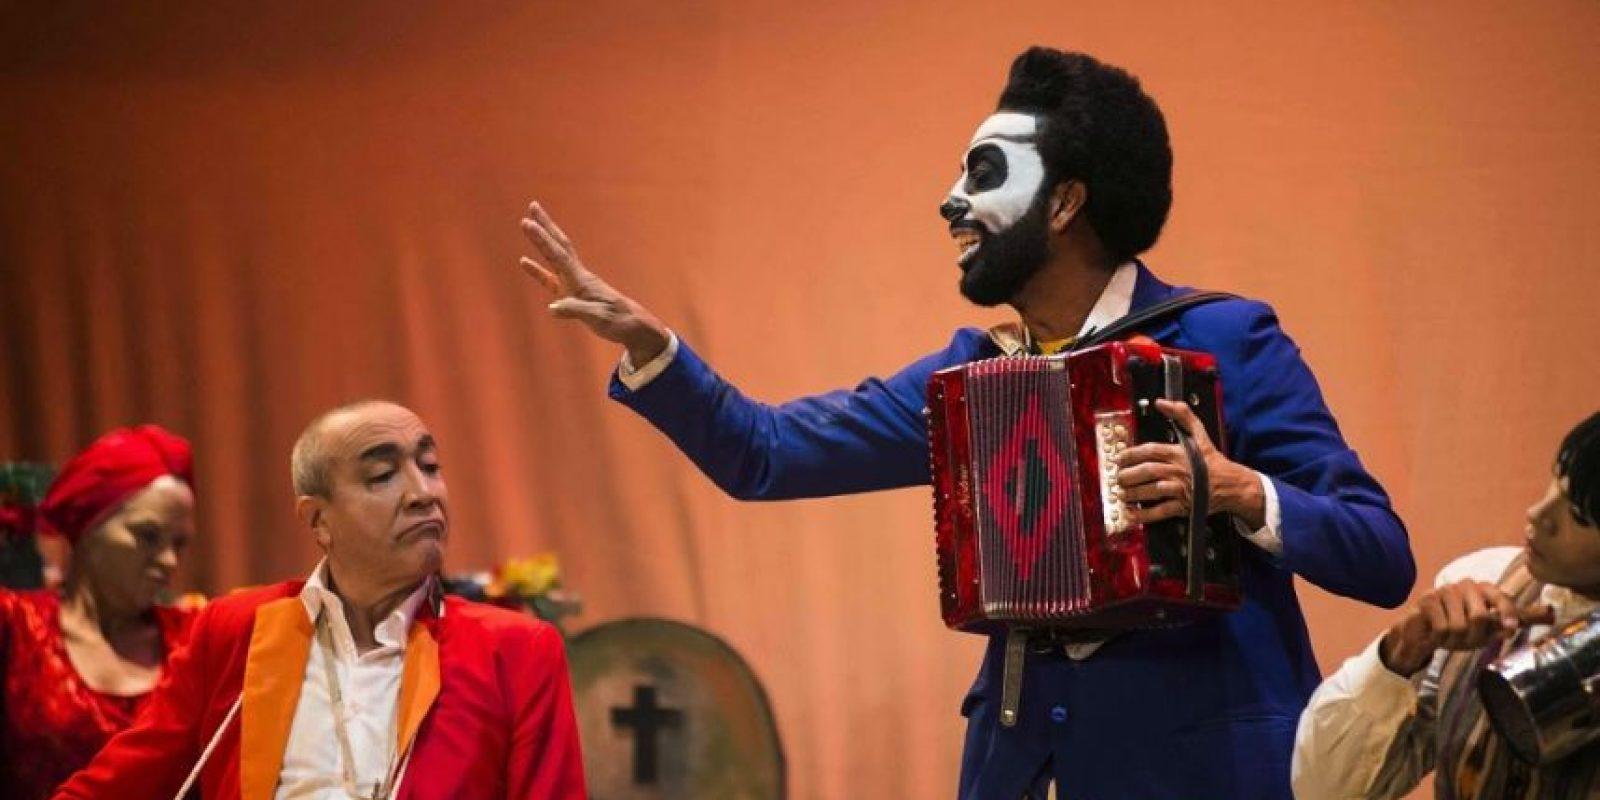 Obra Bolo Francisco de la Compañia Nacional Teatro. Foto:Fuente Externa